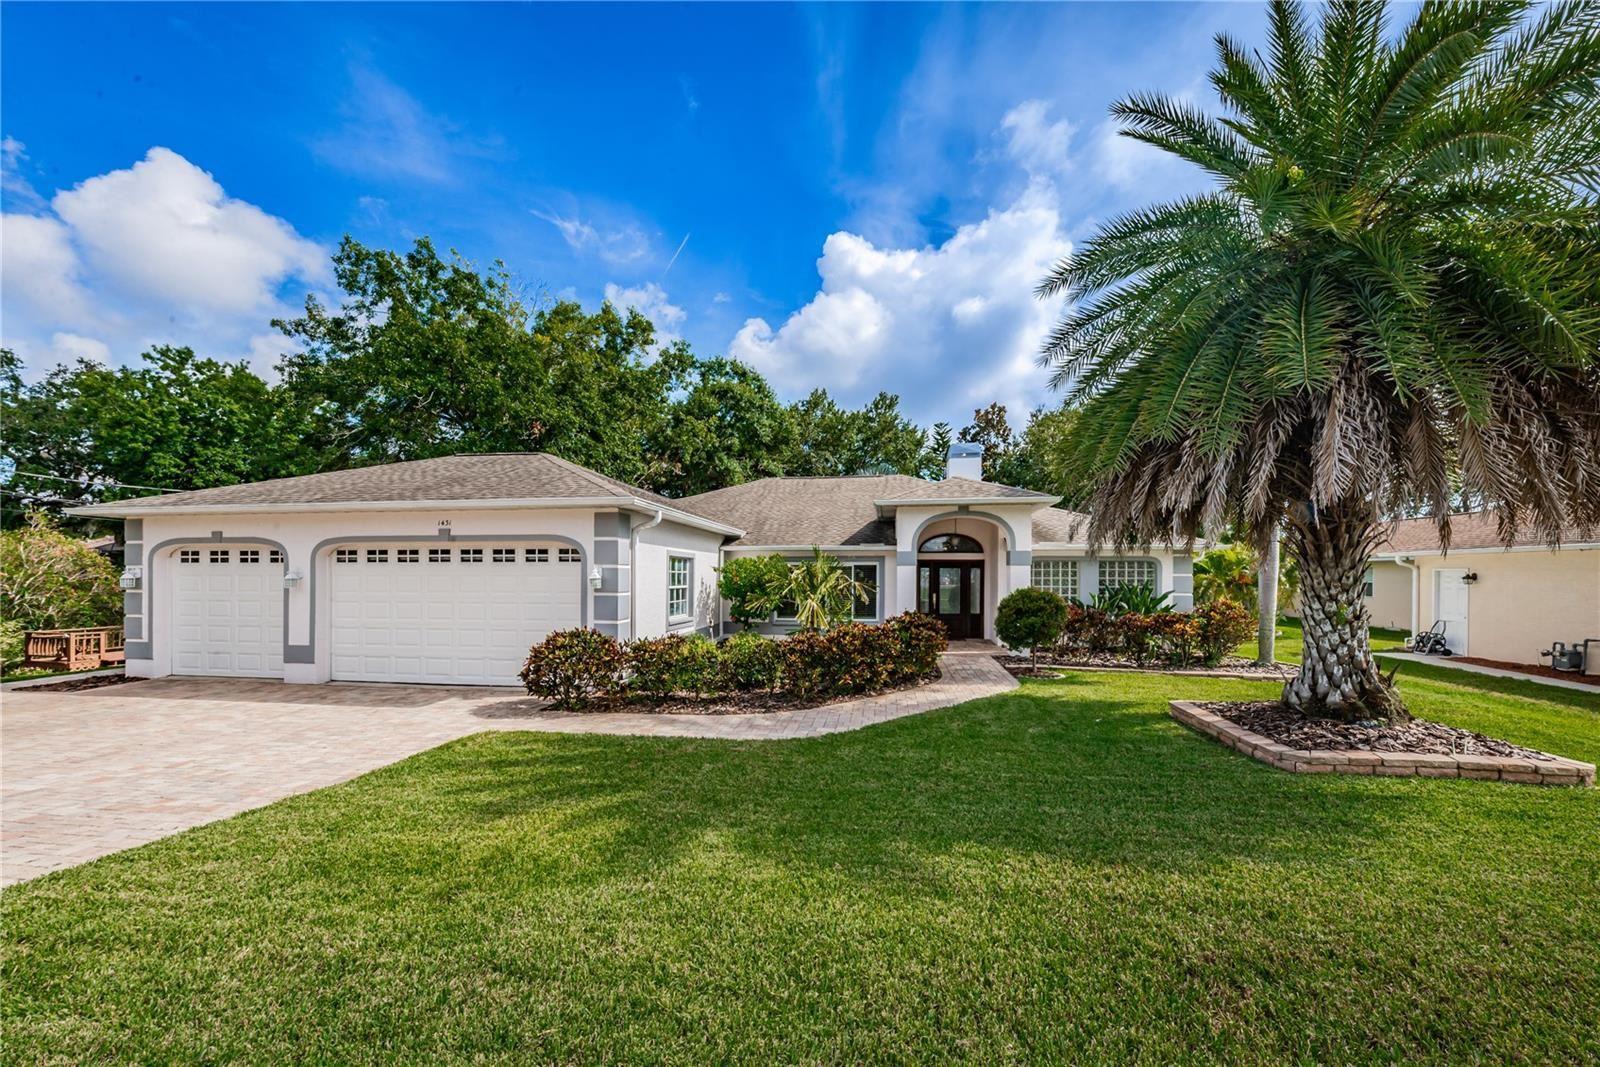 1431 RIVERSIDE DRIVE, Tarpon Springs, FL 34689 - MLS#: U8130740